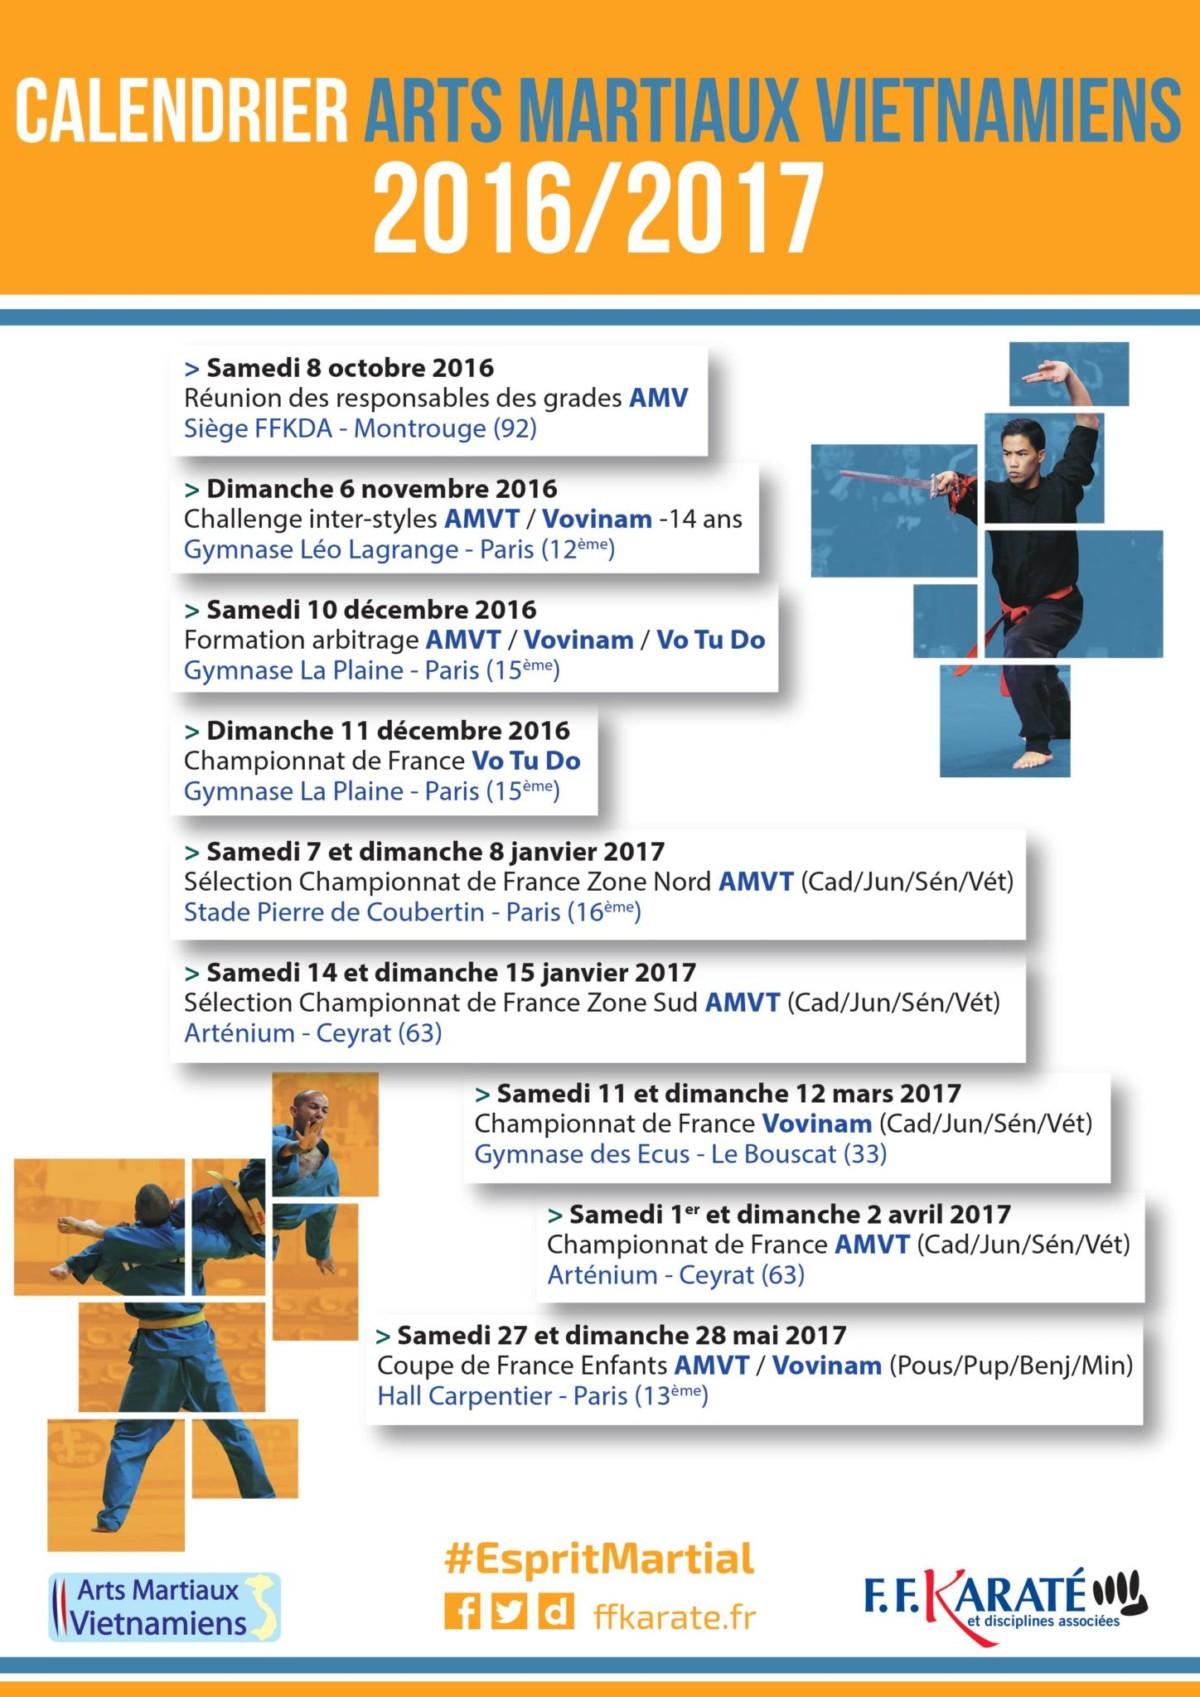 Calendrier arts martiaux vietnamiens 2016 2017 tay son for Arts martiaux pdf